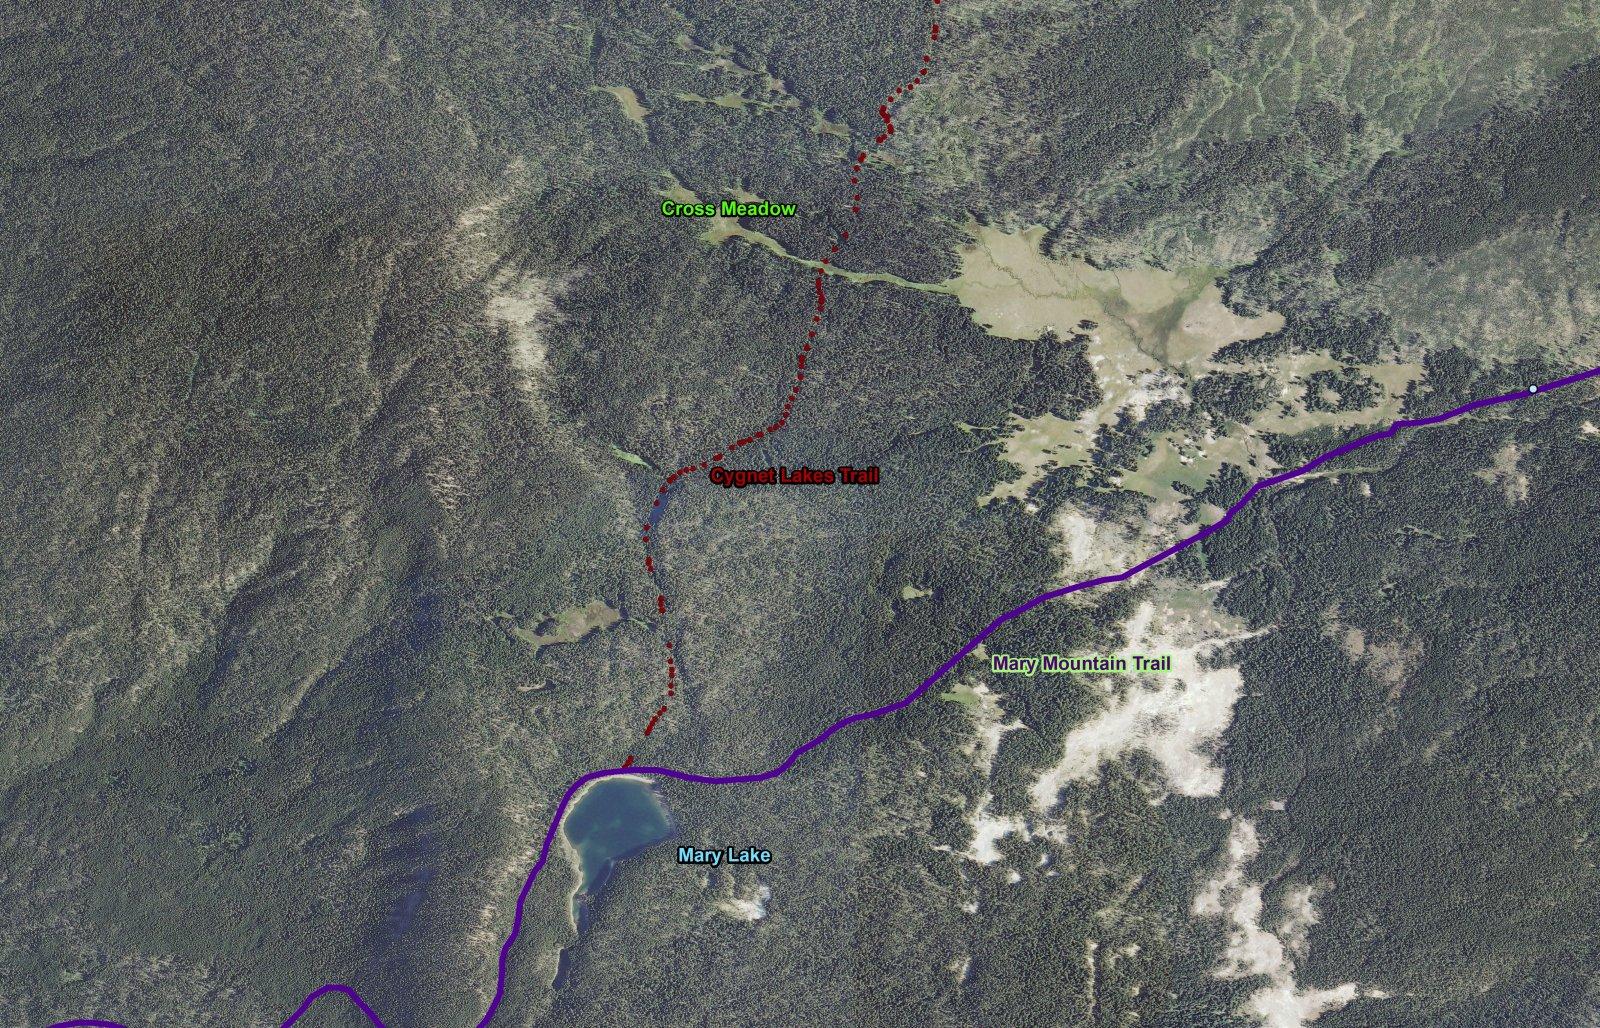 Cygnet_Lakes_Trail.jpg